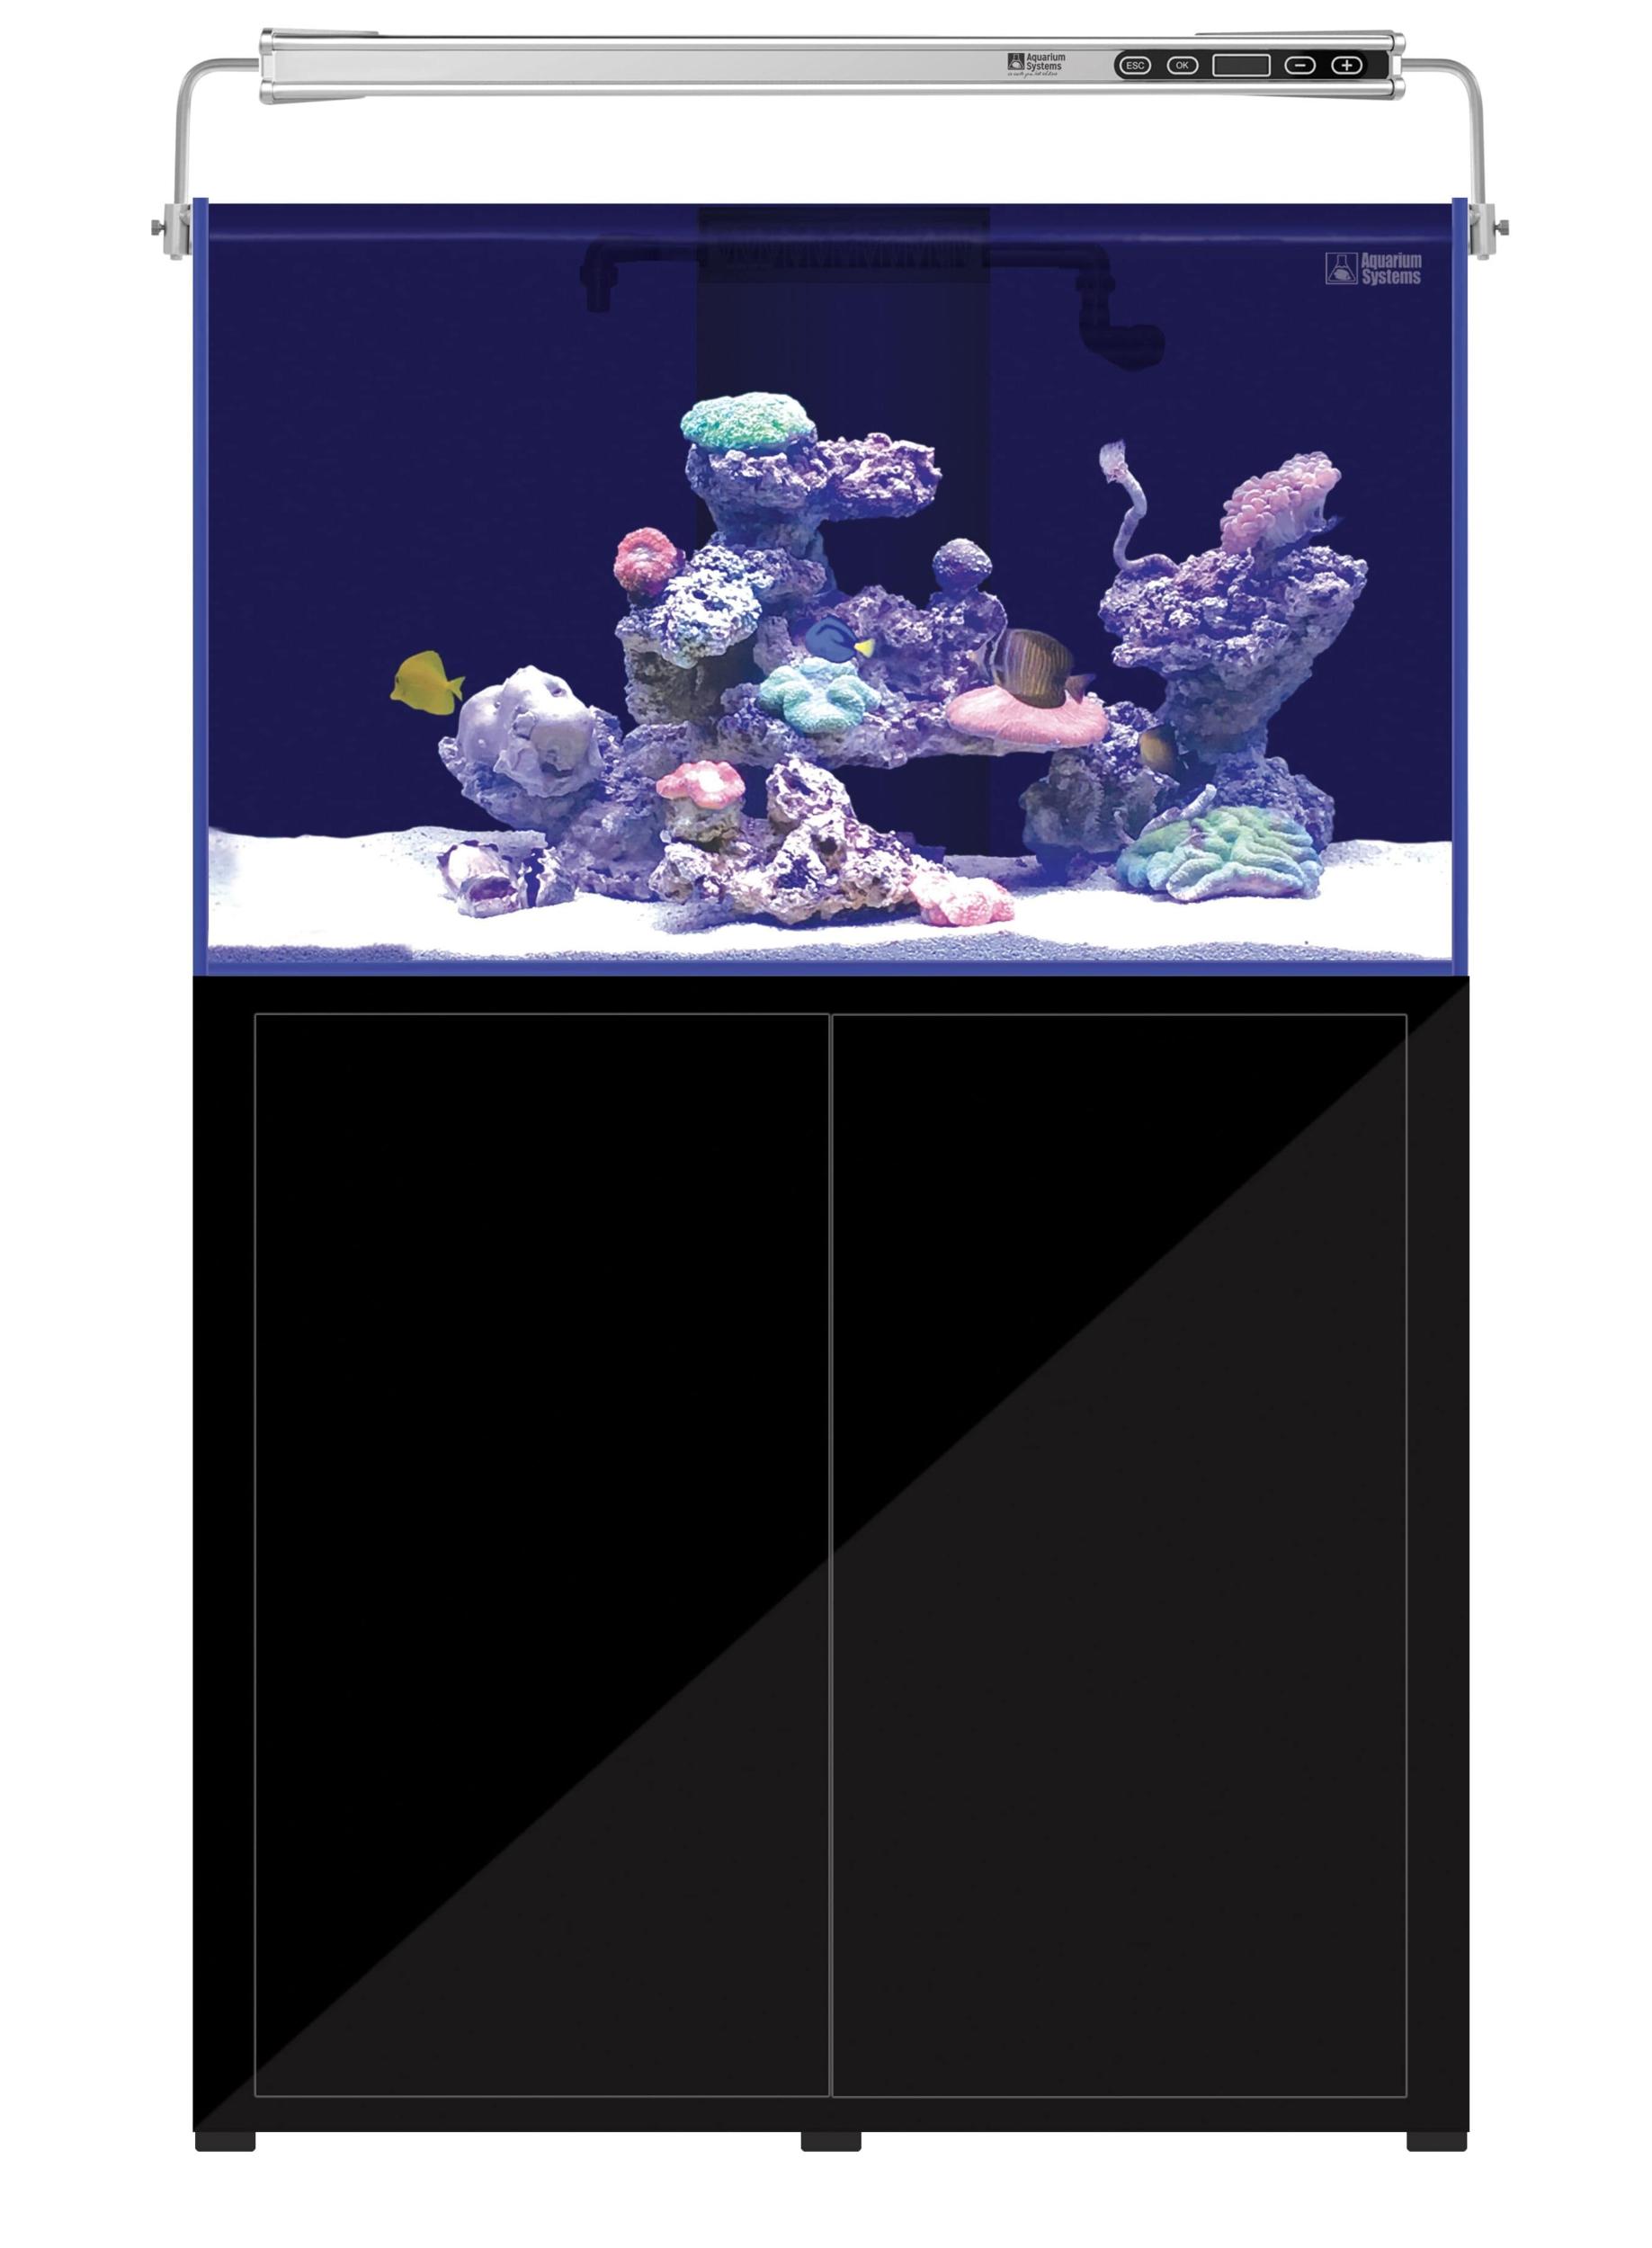 AQUARIUM SYSTEMS L\'Aquarium 370 Noir version 2.0 combinaison aquarium 242 L et meuble